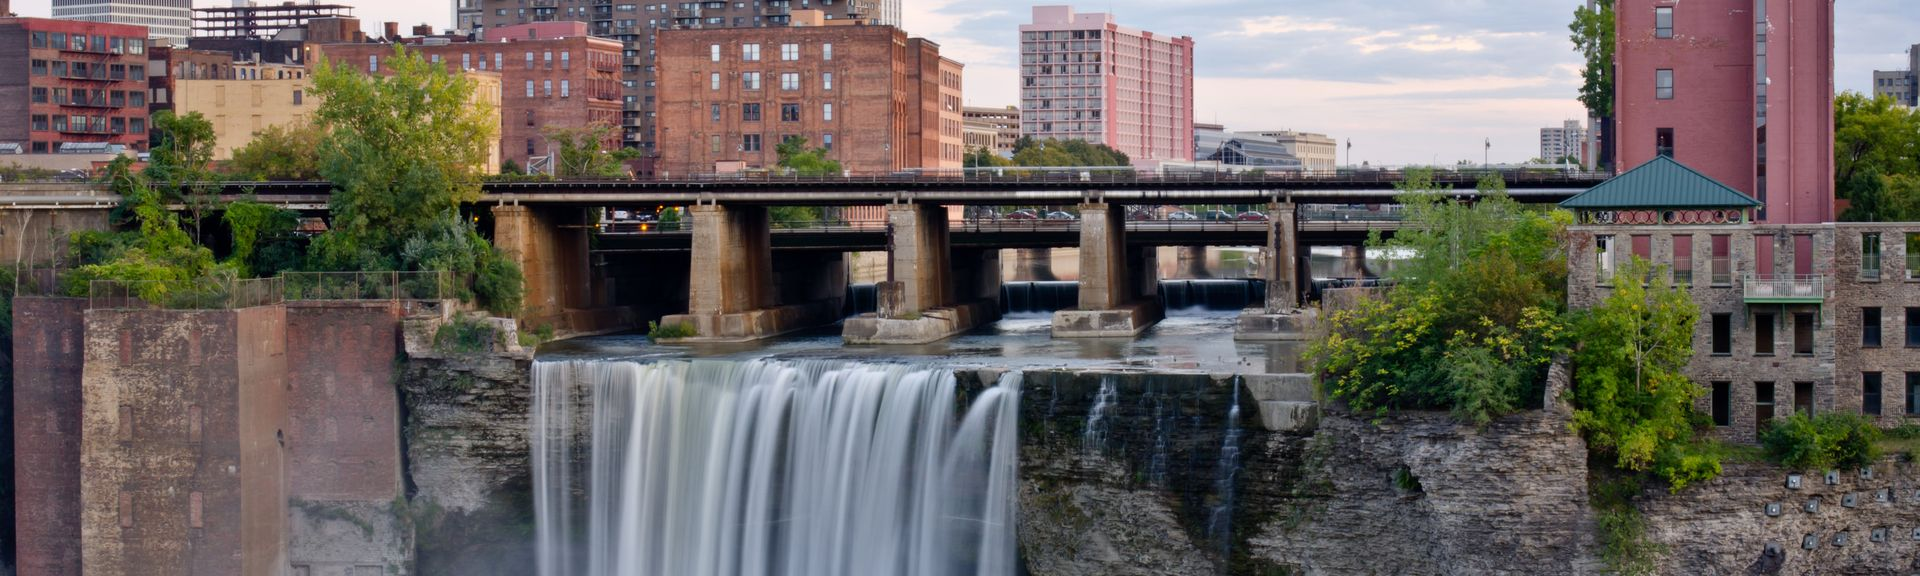 Rochester, New York, United States of America